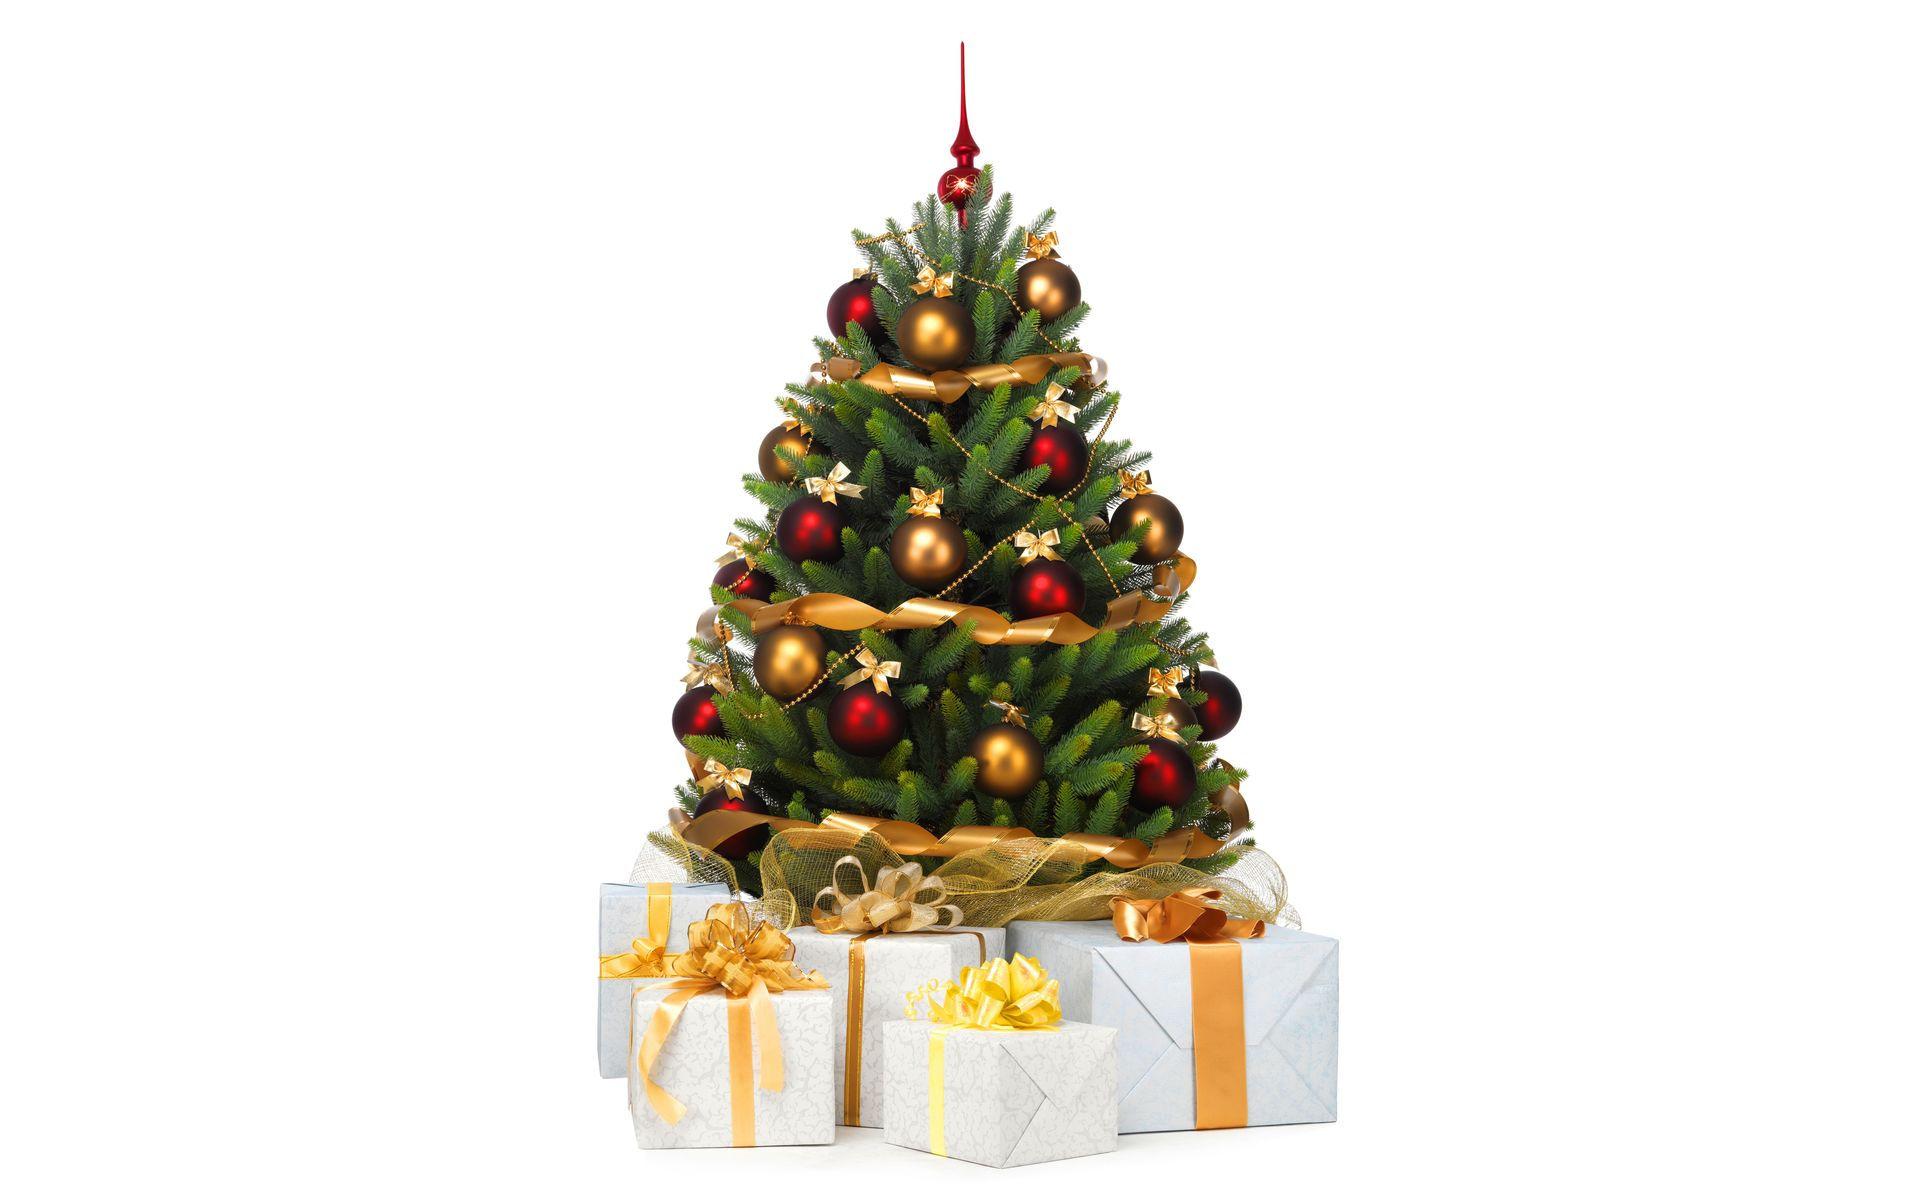 Украшенная ёлка с подарками